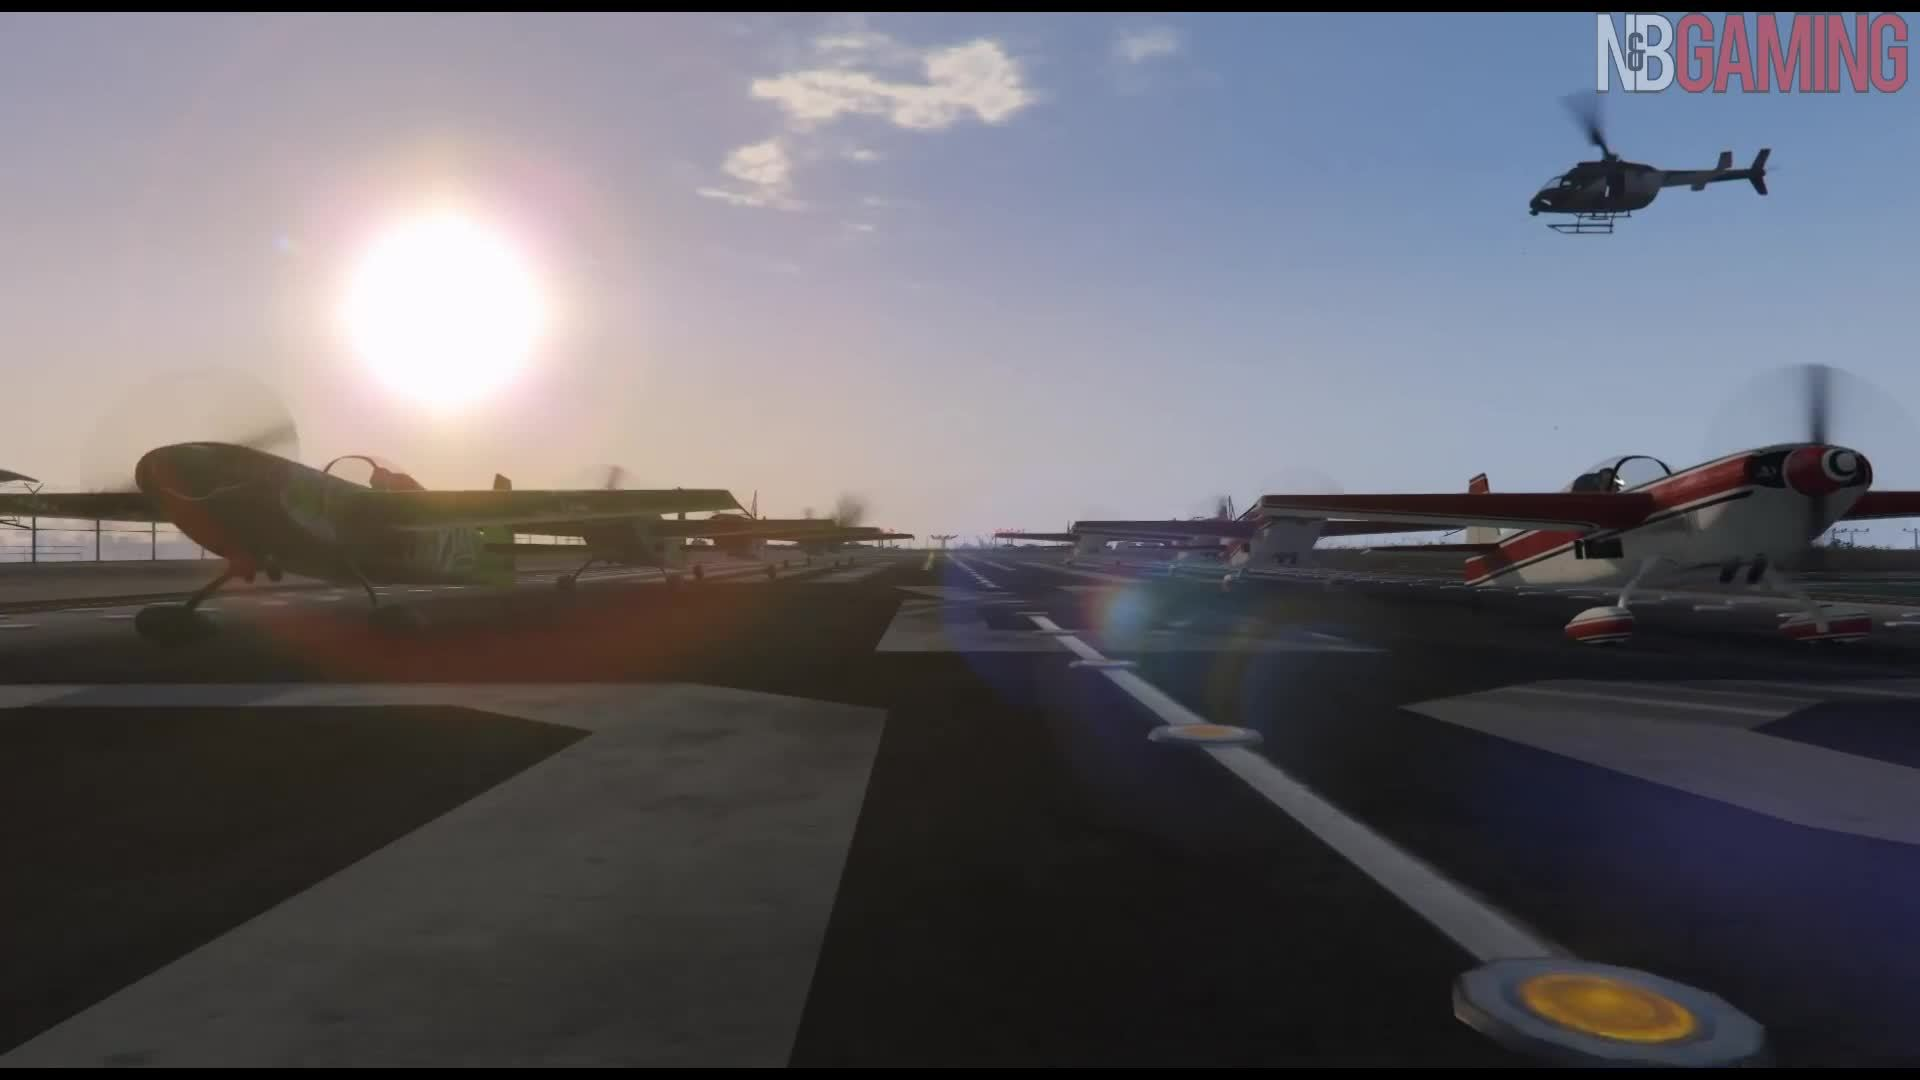 gaming_gifs, gta, gtaonline, Pearl Harbor GTA5 Style GIFs